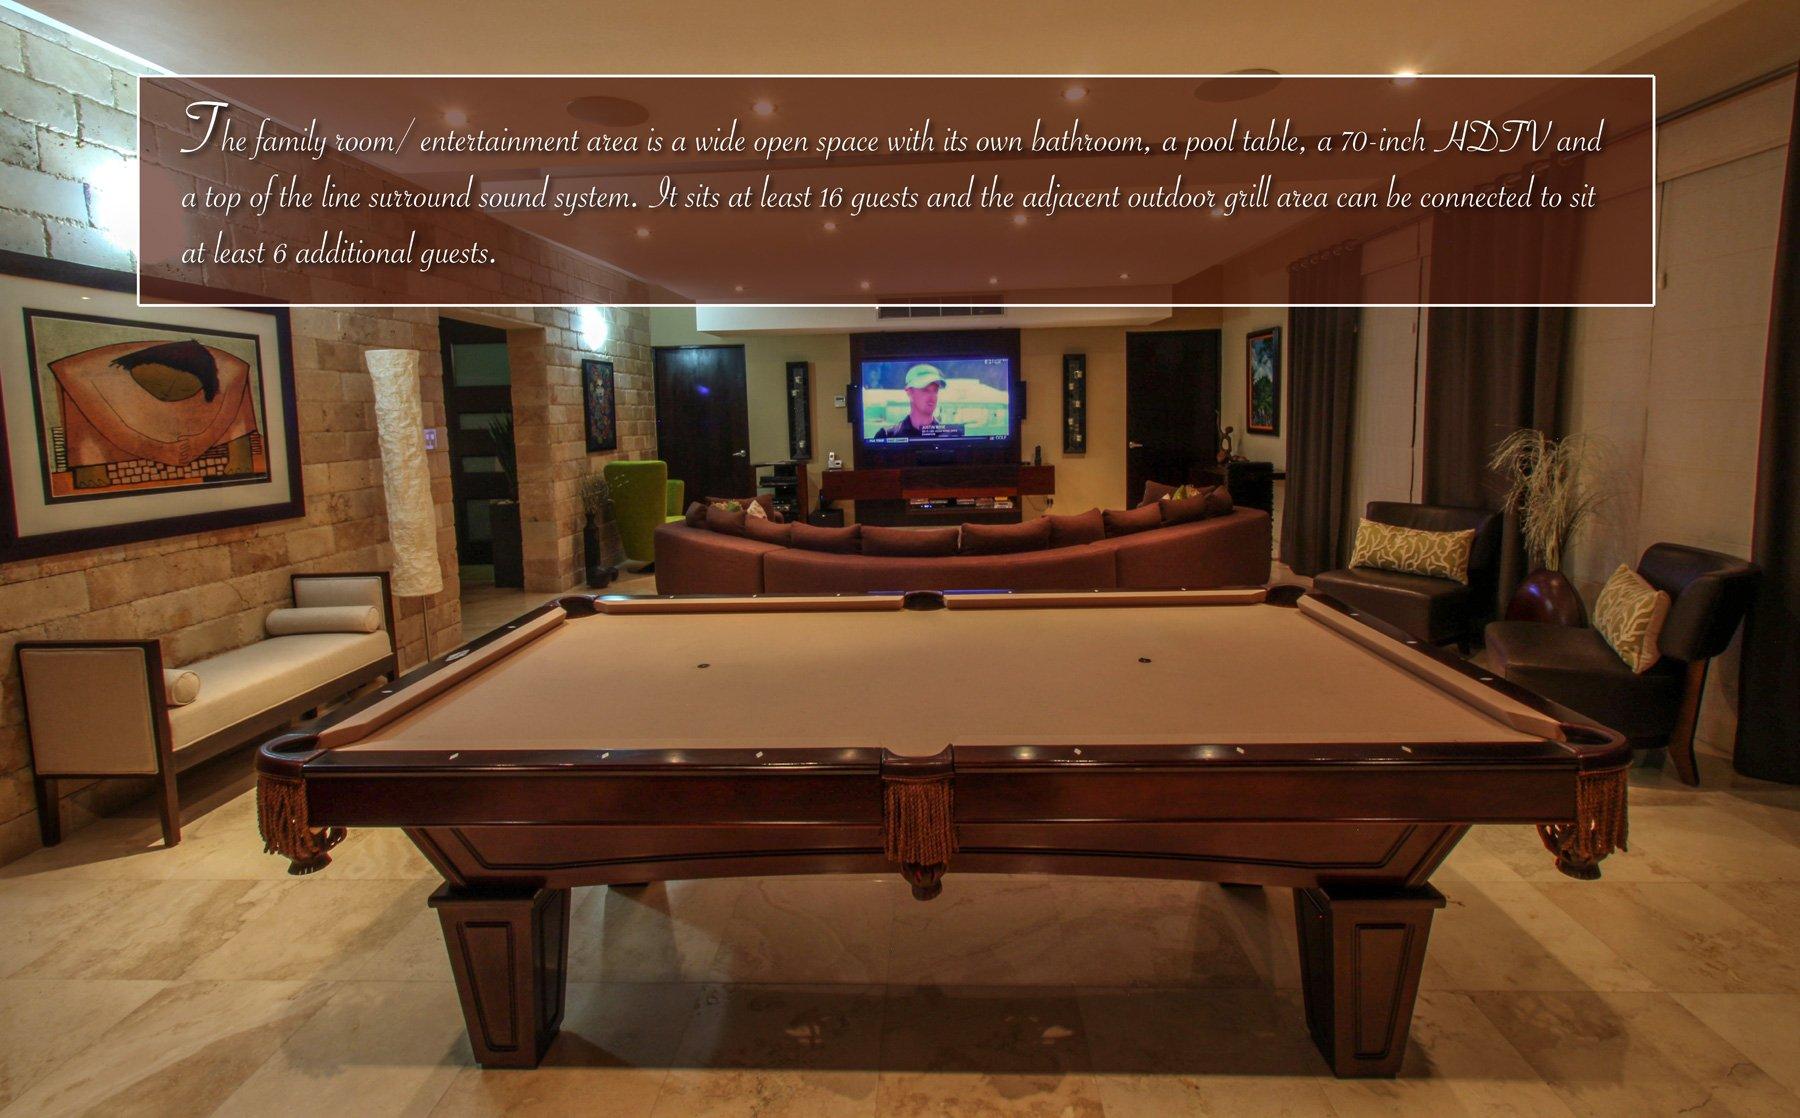 Villa Capri Caribbean Luxury Rentals - Outdoor pool table rental